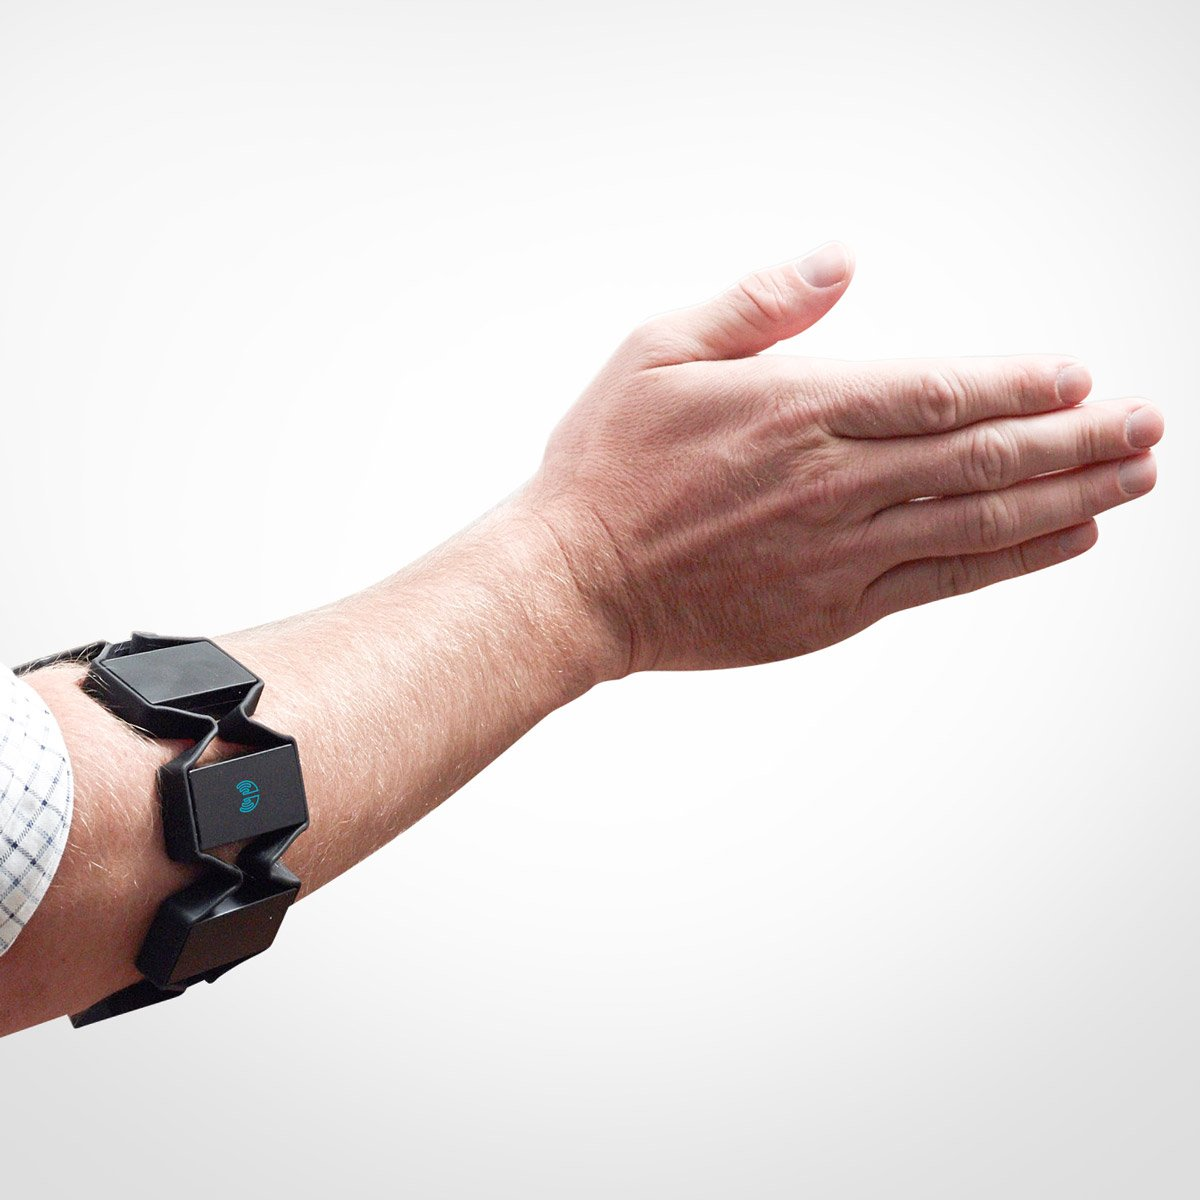 Myo gesture control armband ebay